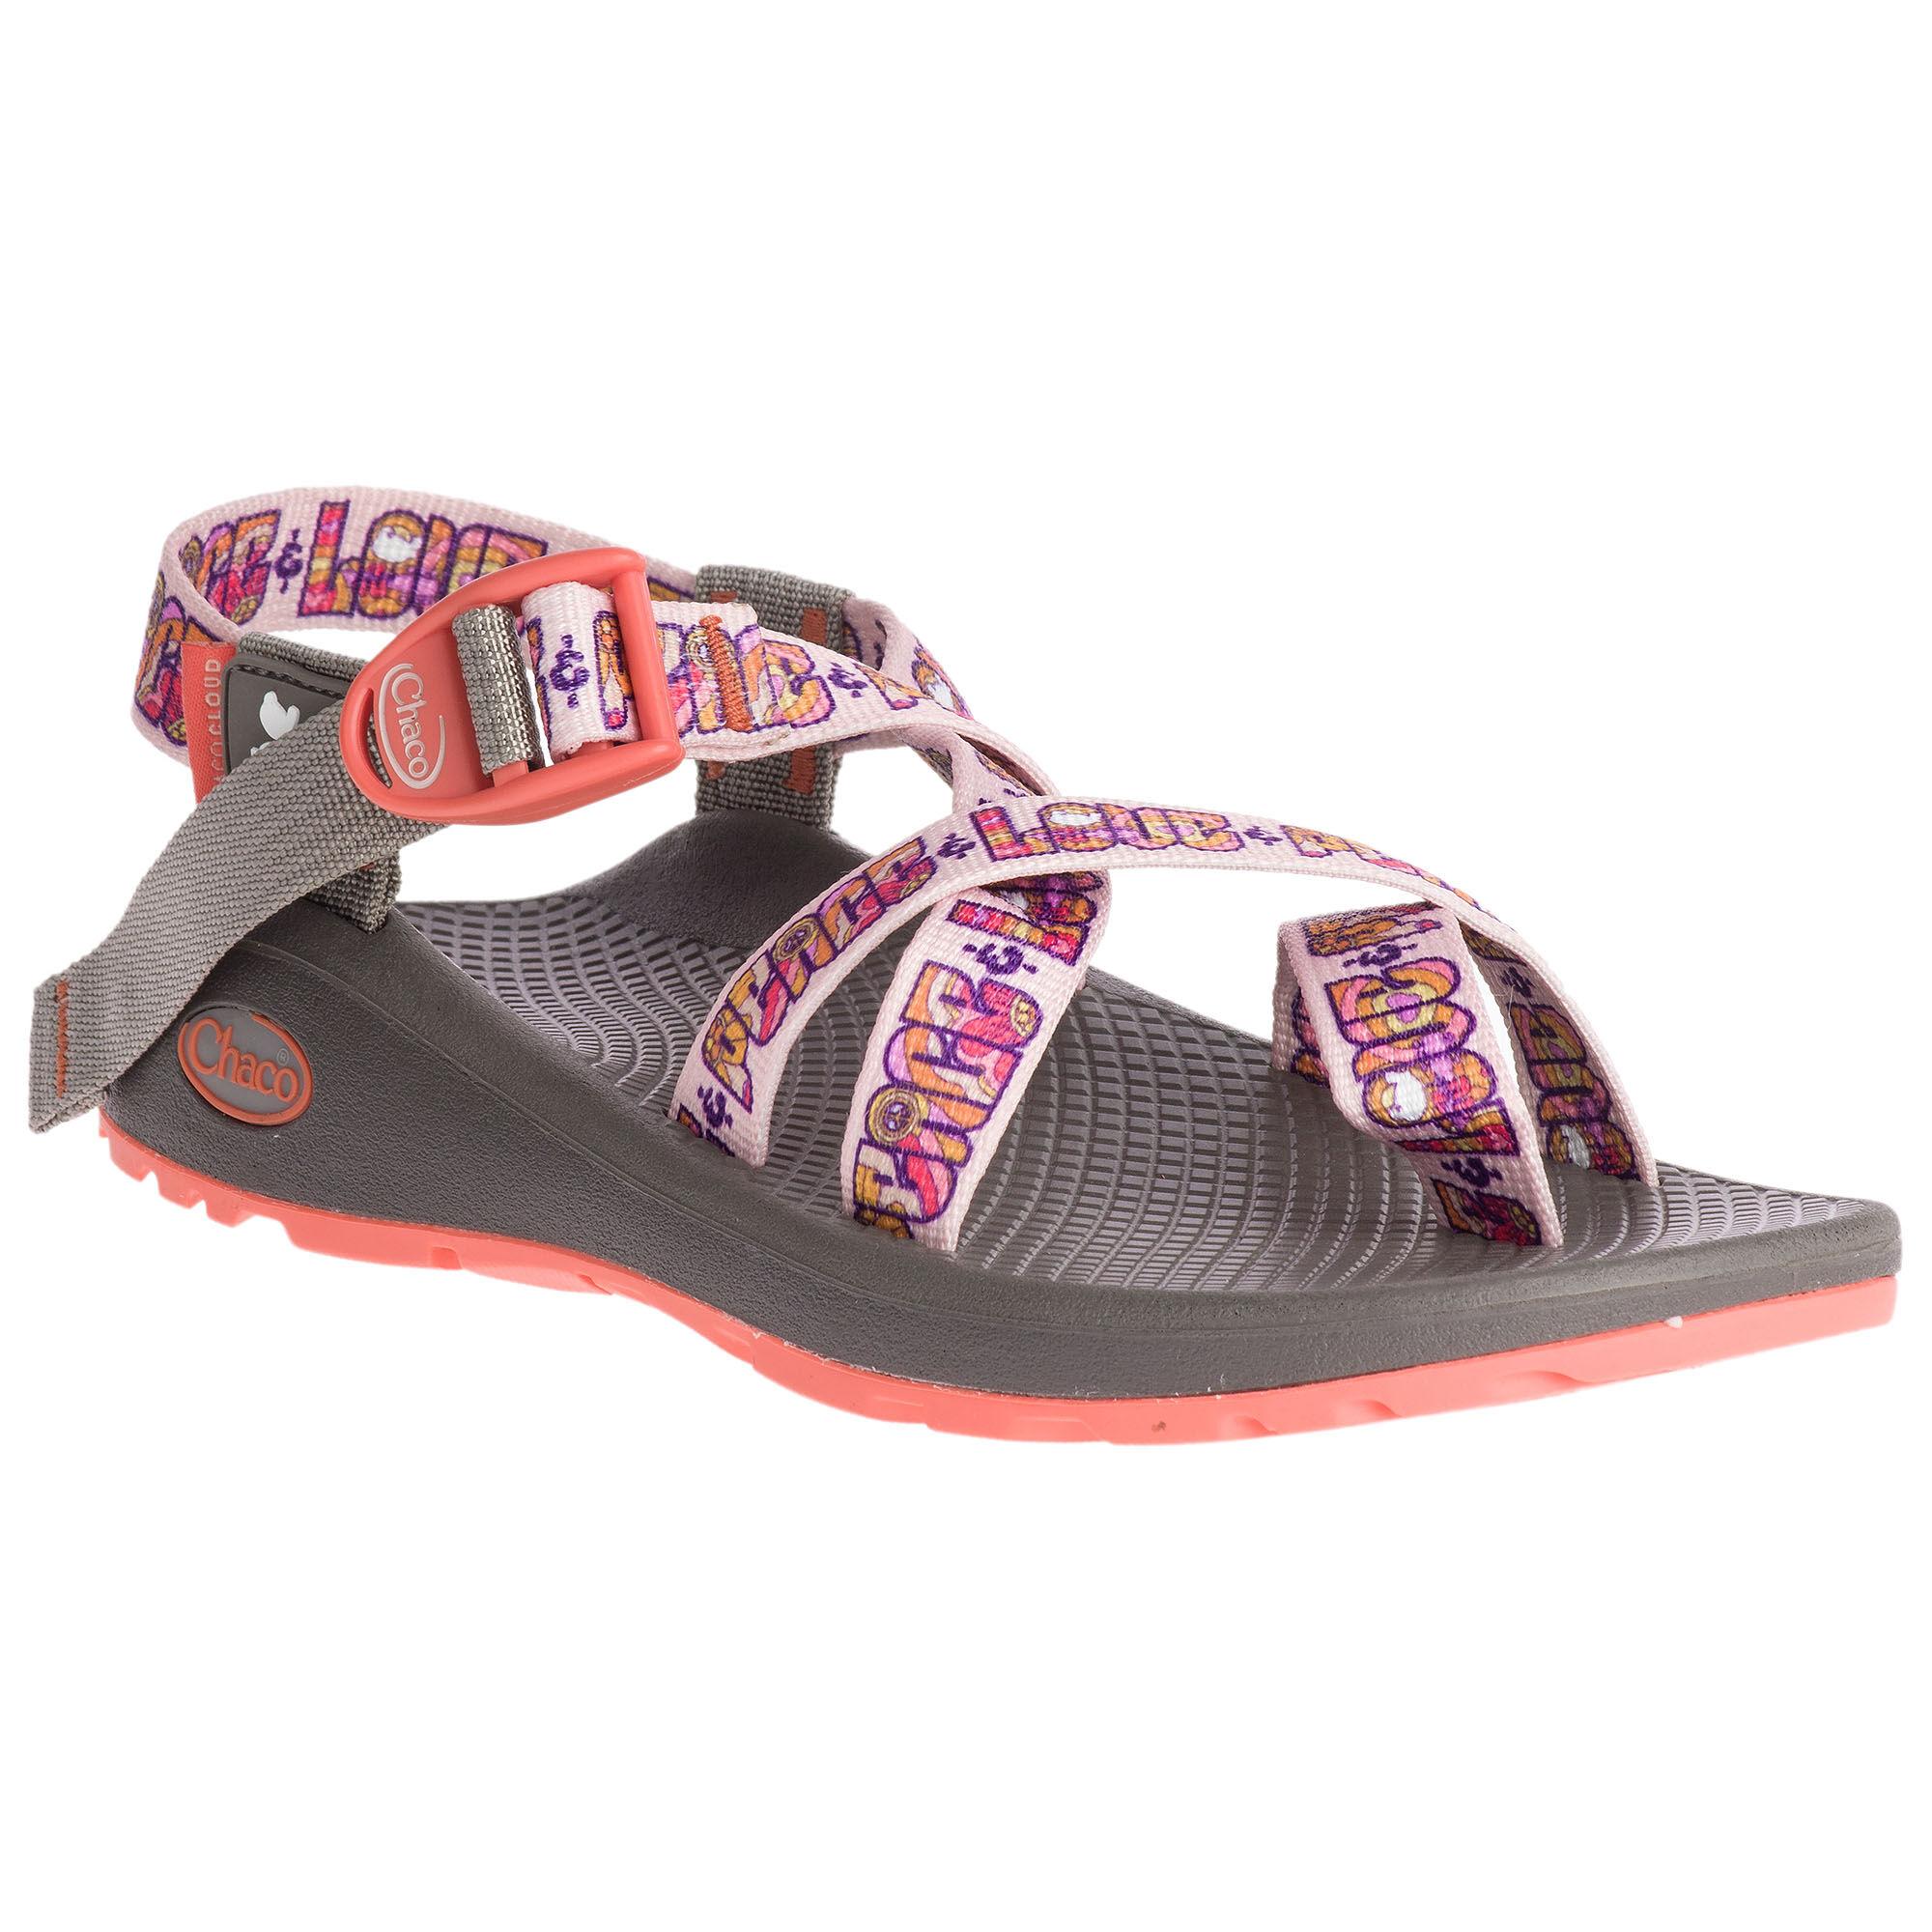 Chaco Women's Z/Cloud 2 Woodstock Sandals  - Peach Peace - Size: 6